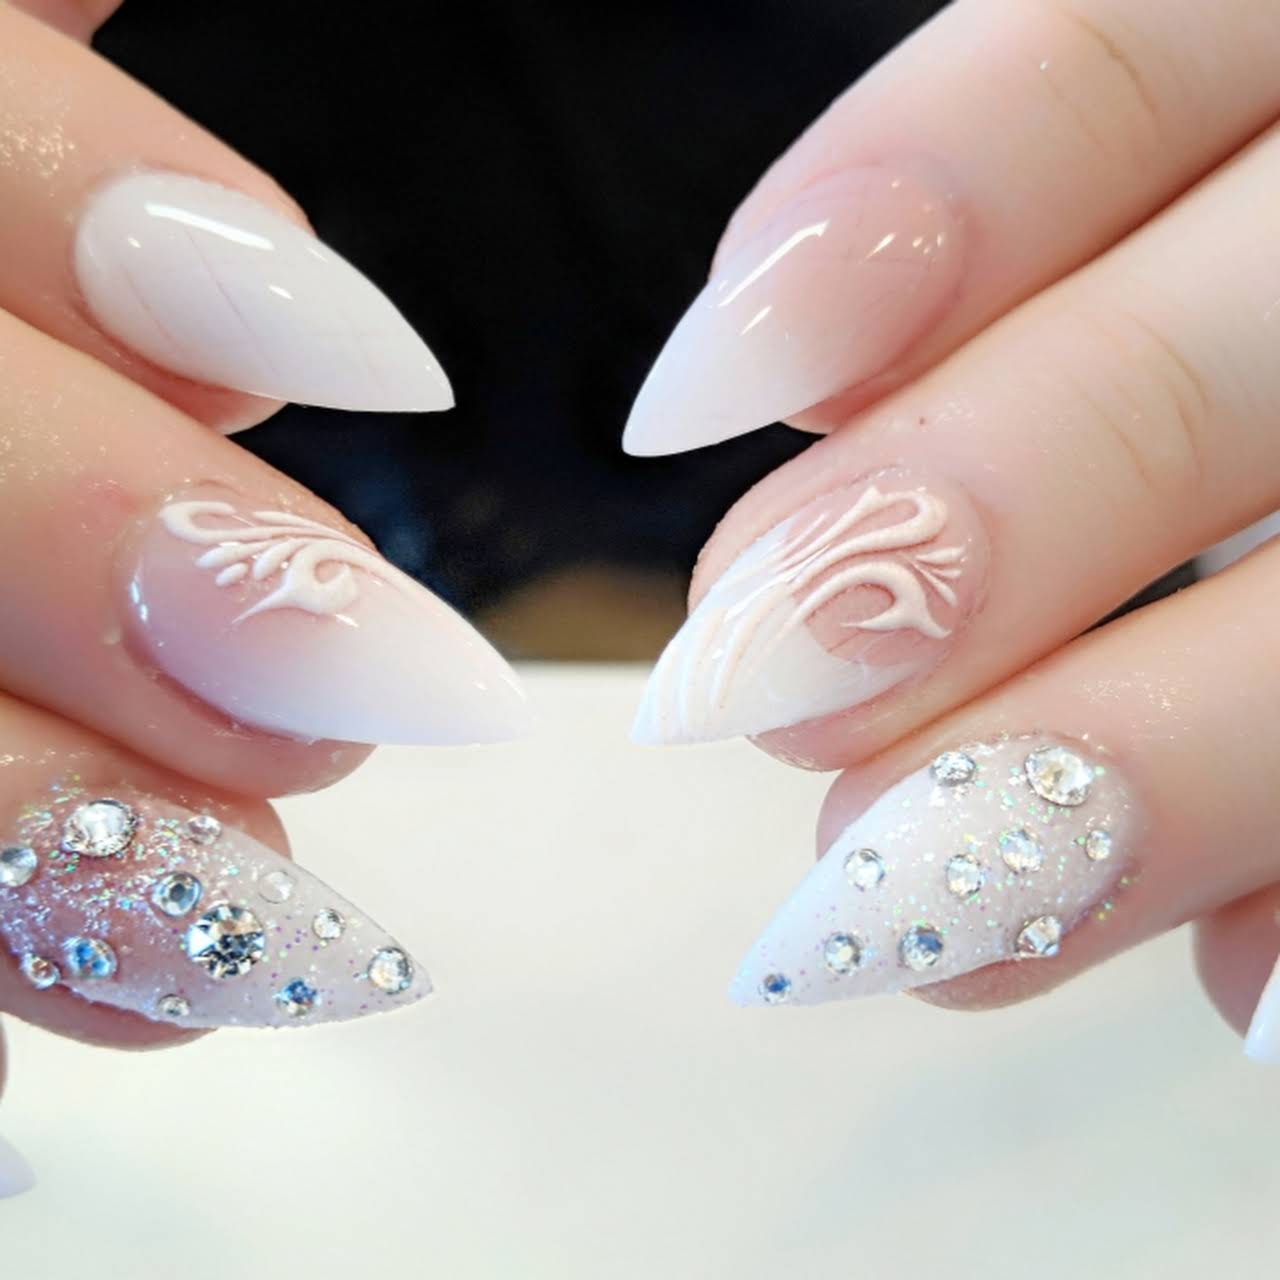 Celebrity Nail Salon: Celebrity Nail Spa, Nail Spa, Nail Salon, Salon Spa, Best